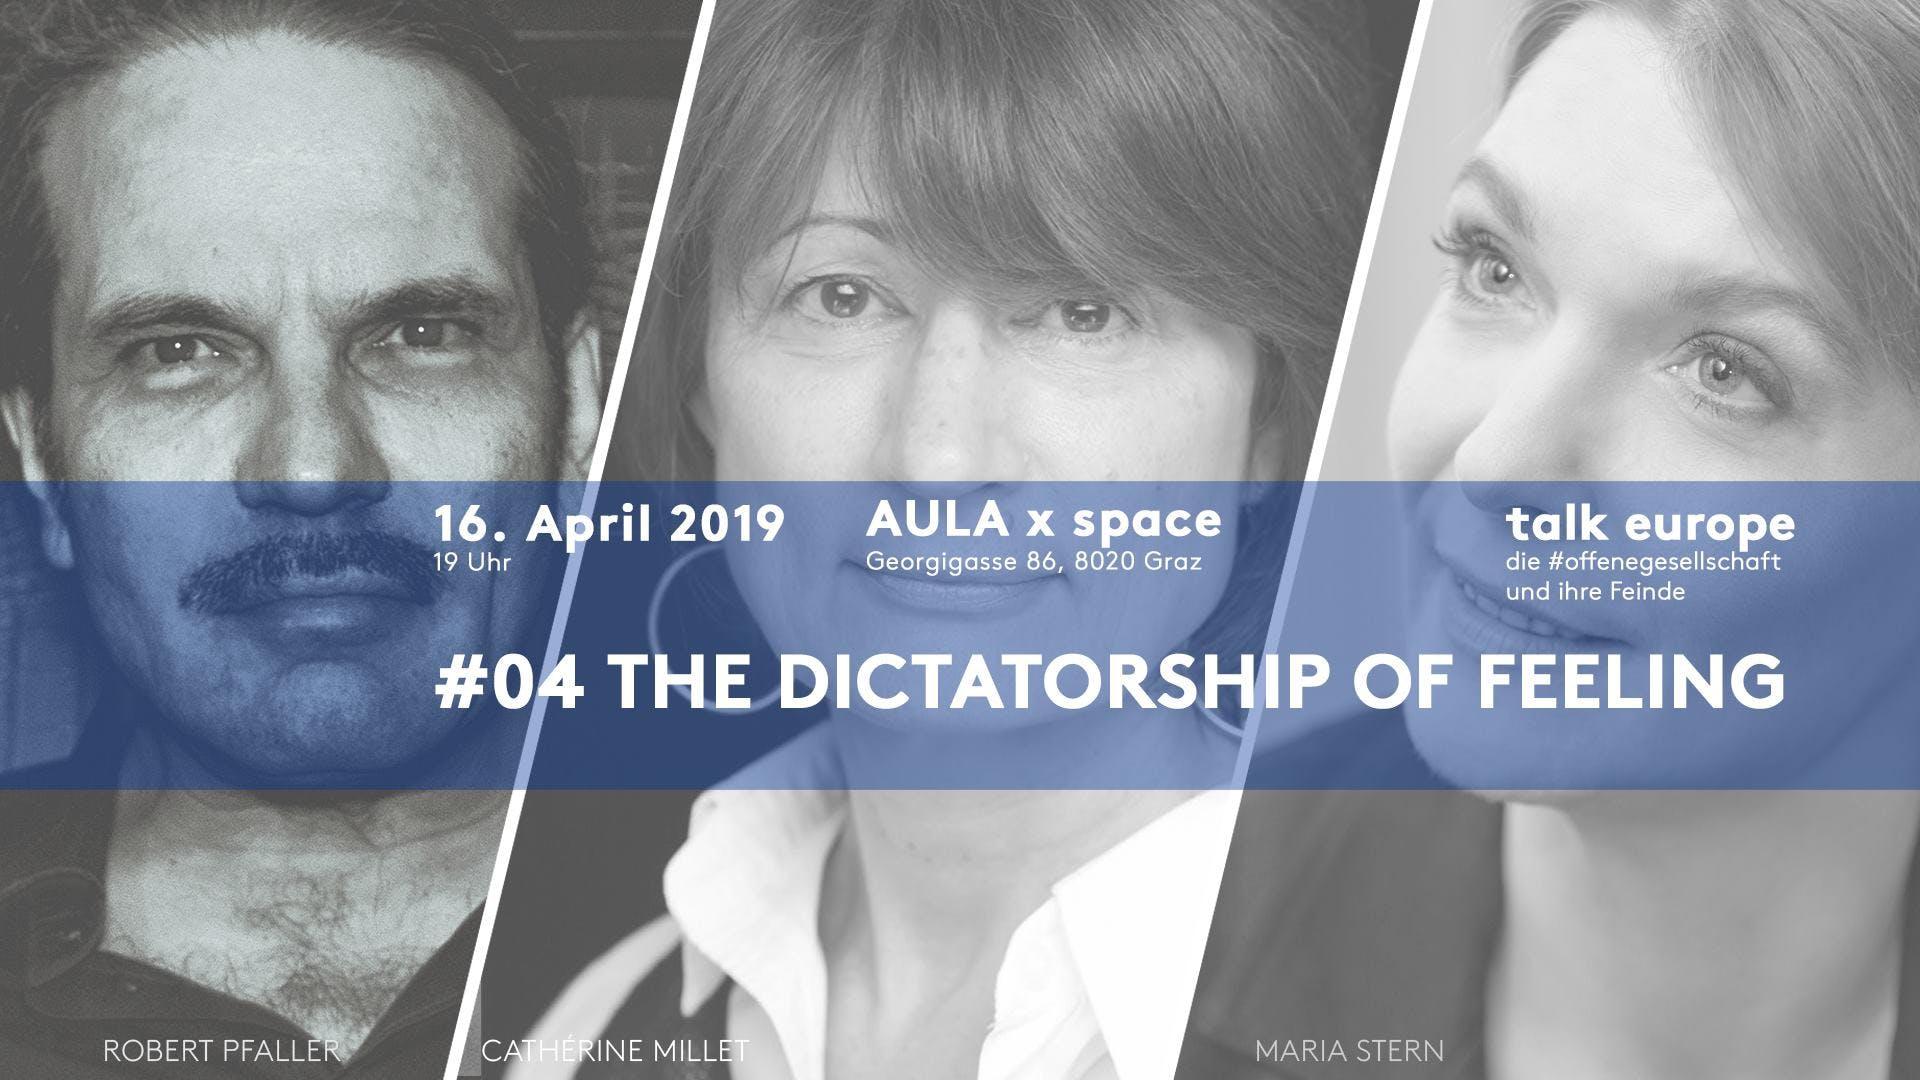 The dictatorship of feeling